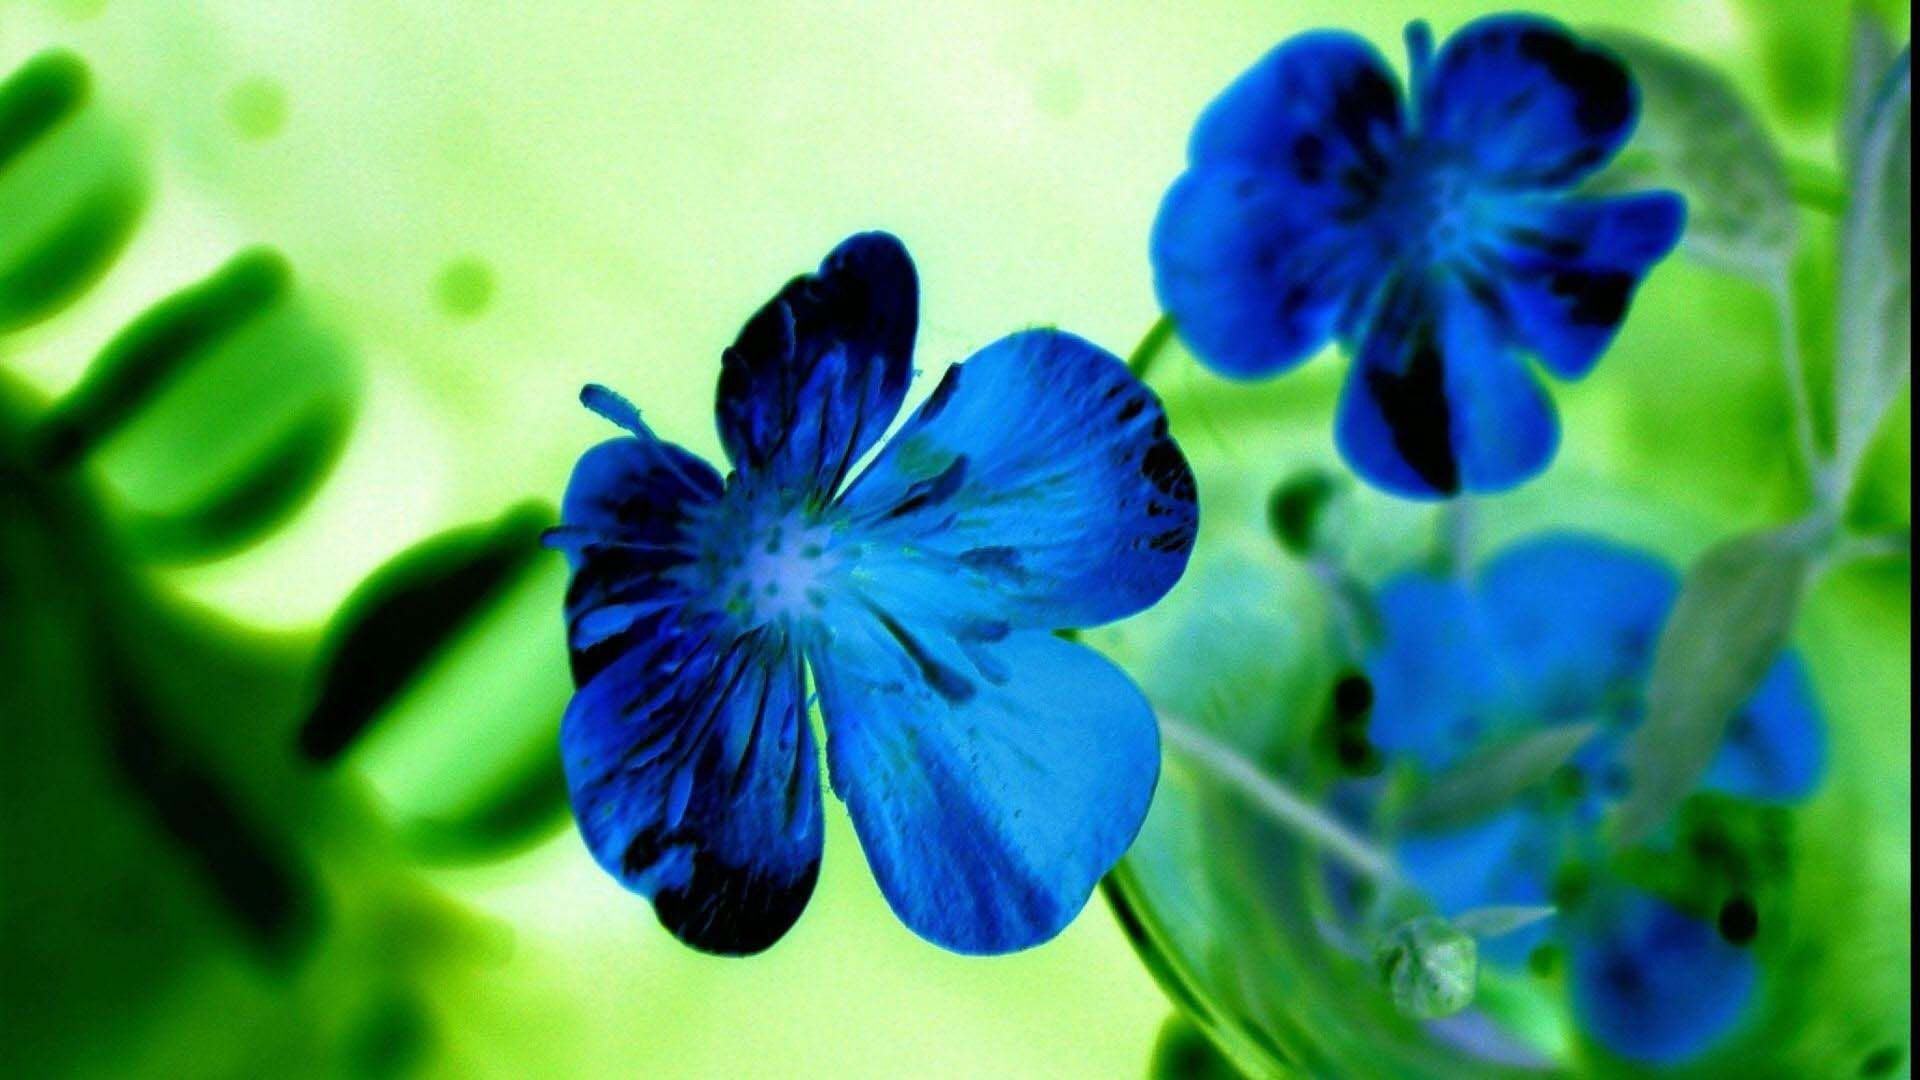 Blue Flower Wallpaper Jpg X Desktop 180946